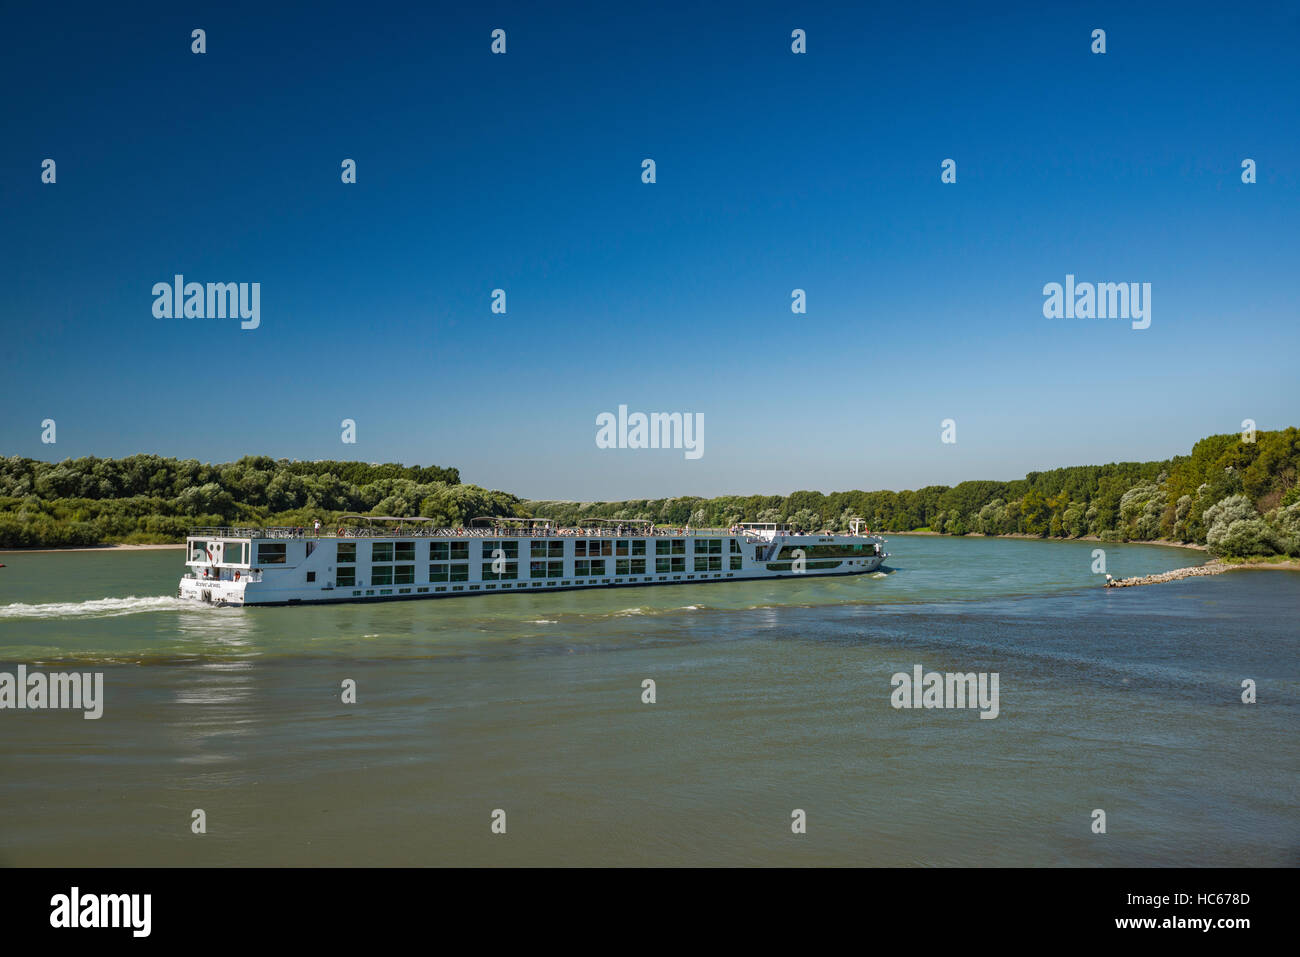 Scenic Jewel river cruise ship, registered in Valletta, Malta, on Danube river, at confluence with Morava, near Stock Photo